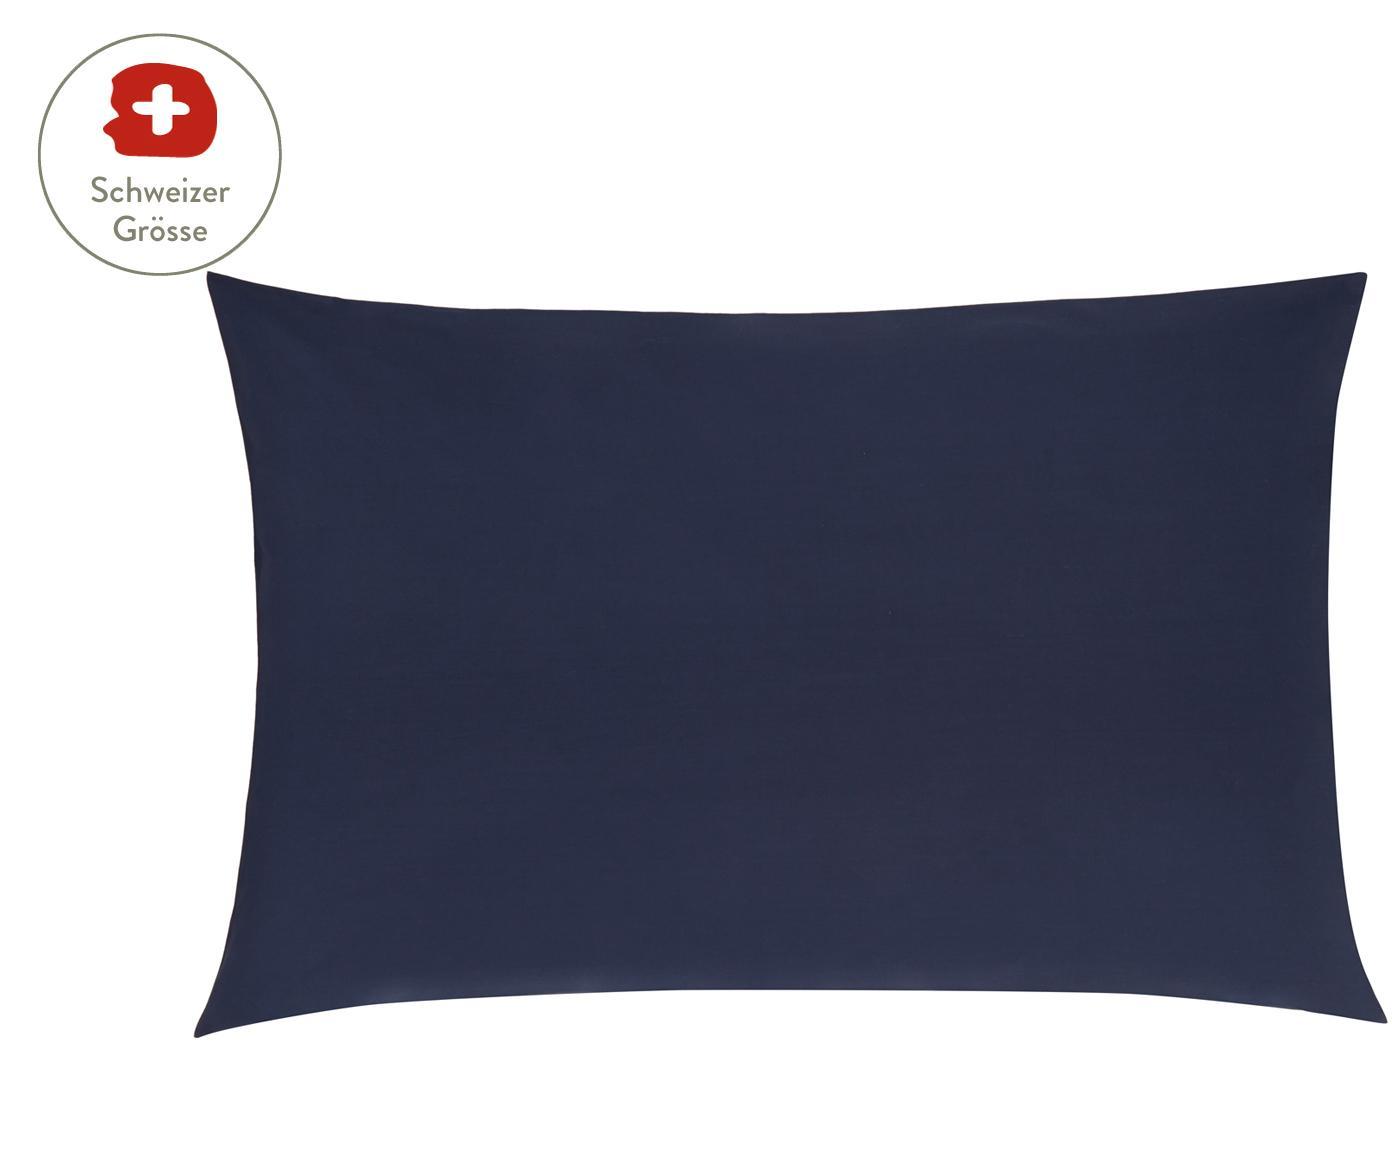 Baumwollperkal-Kissenbezug Elsie in Dunkelblau, Webart: Perkal Fadendichte 200 TC, Dunkelblau, 65 x 100 cm